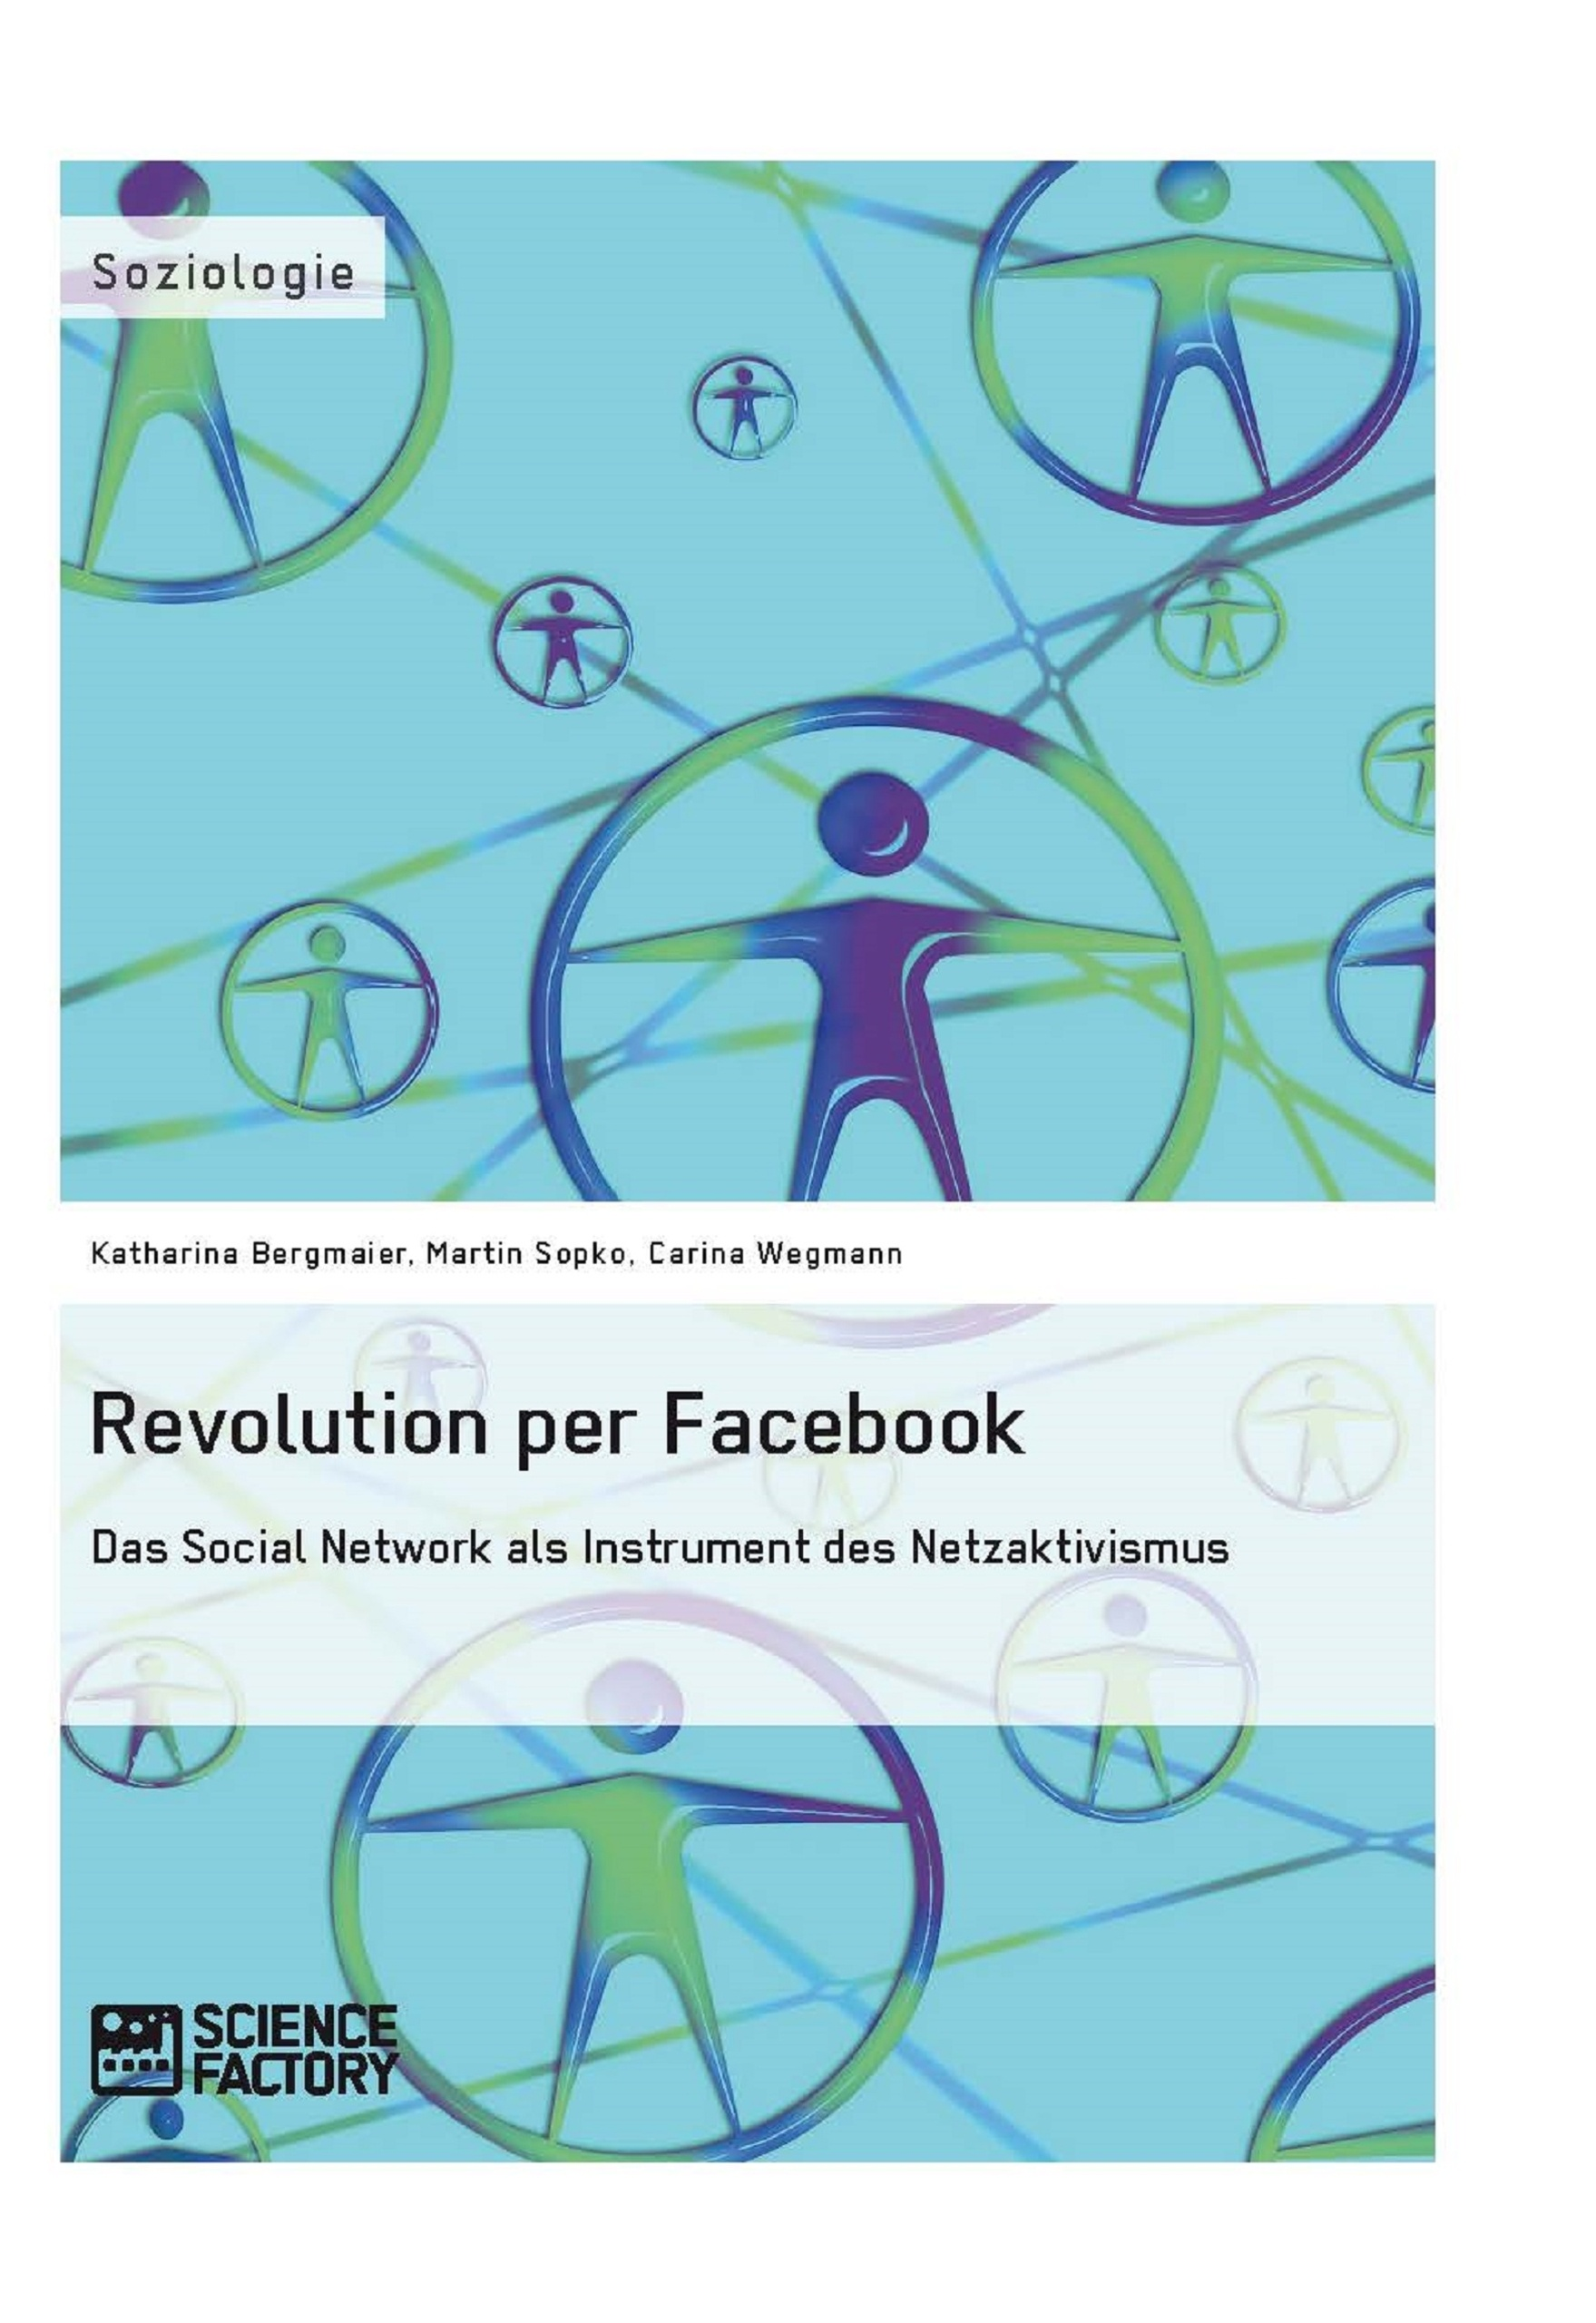 Titel: Revolution per Facebook. Das Social Network als Instrument des Netzaktivismus